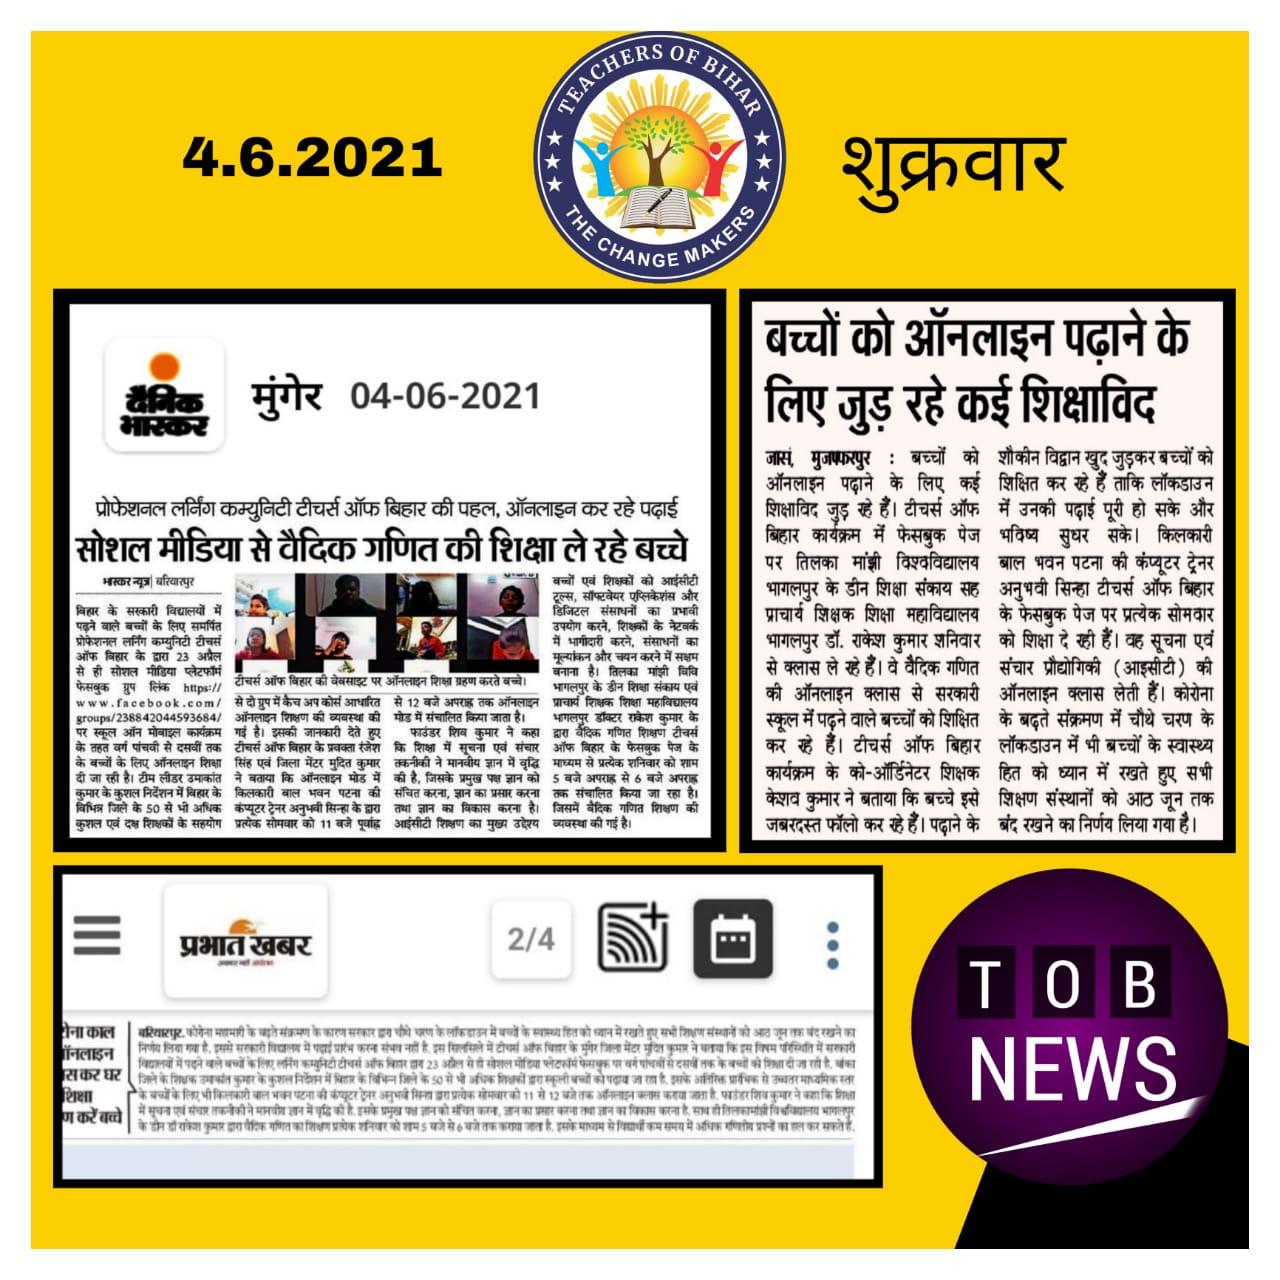 Teachers of Bihar , 04.06.2021